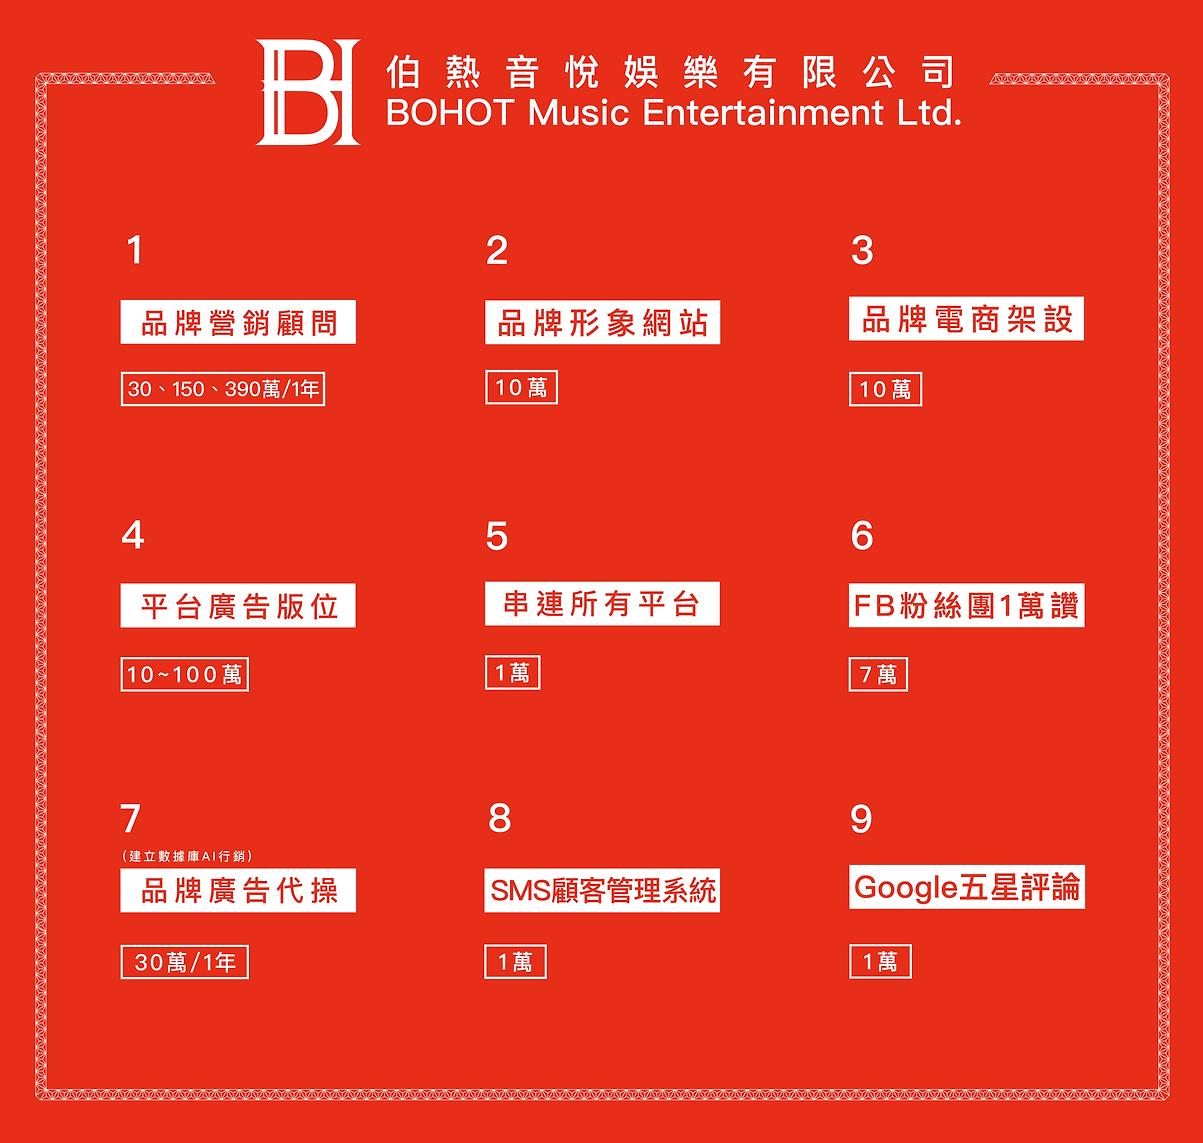 new品牌營運-報價單1107.png